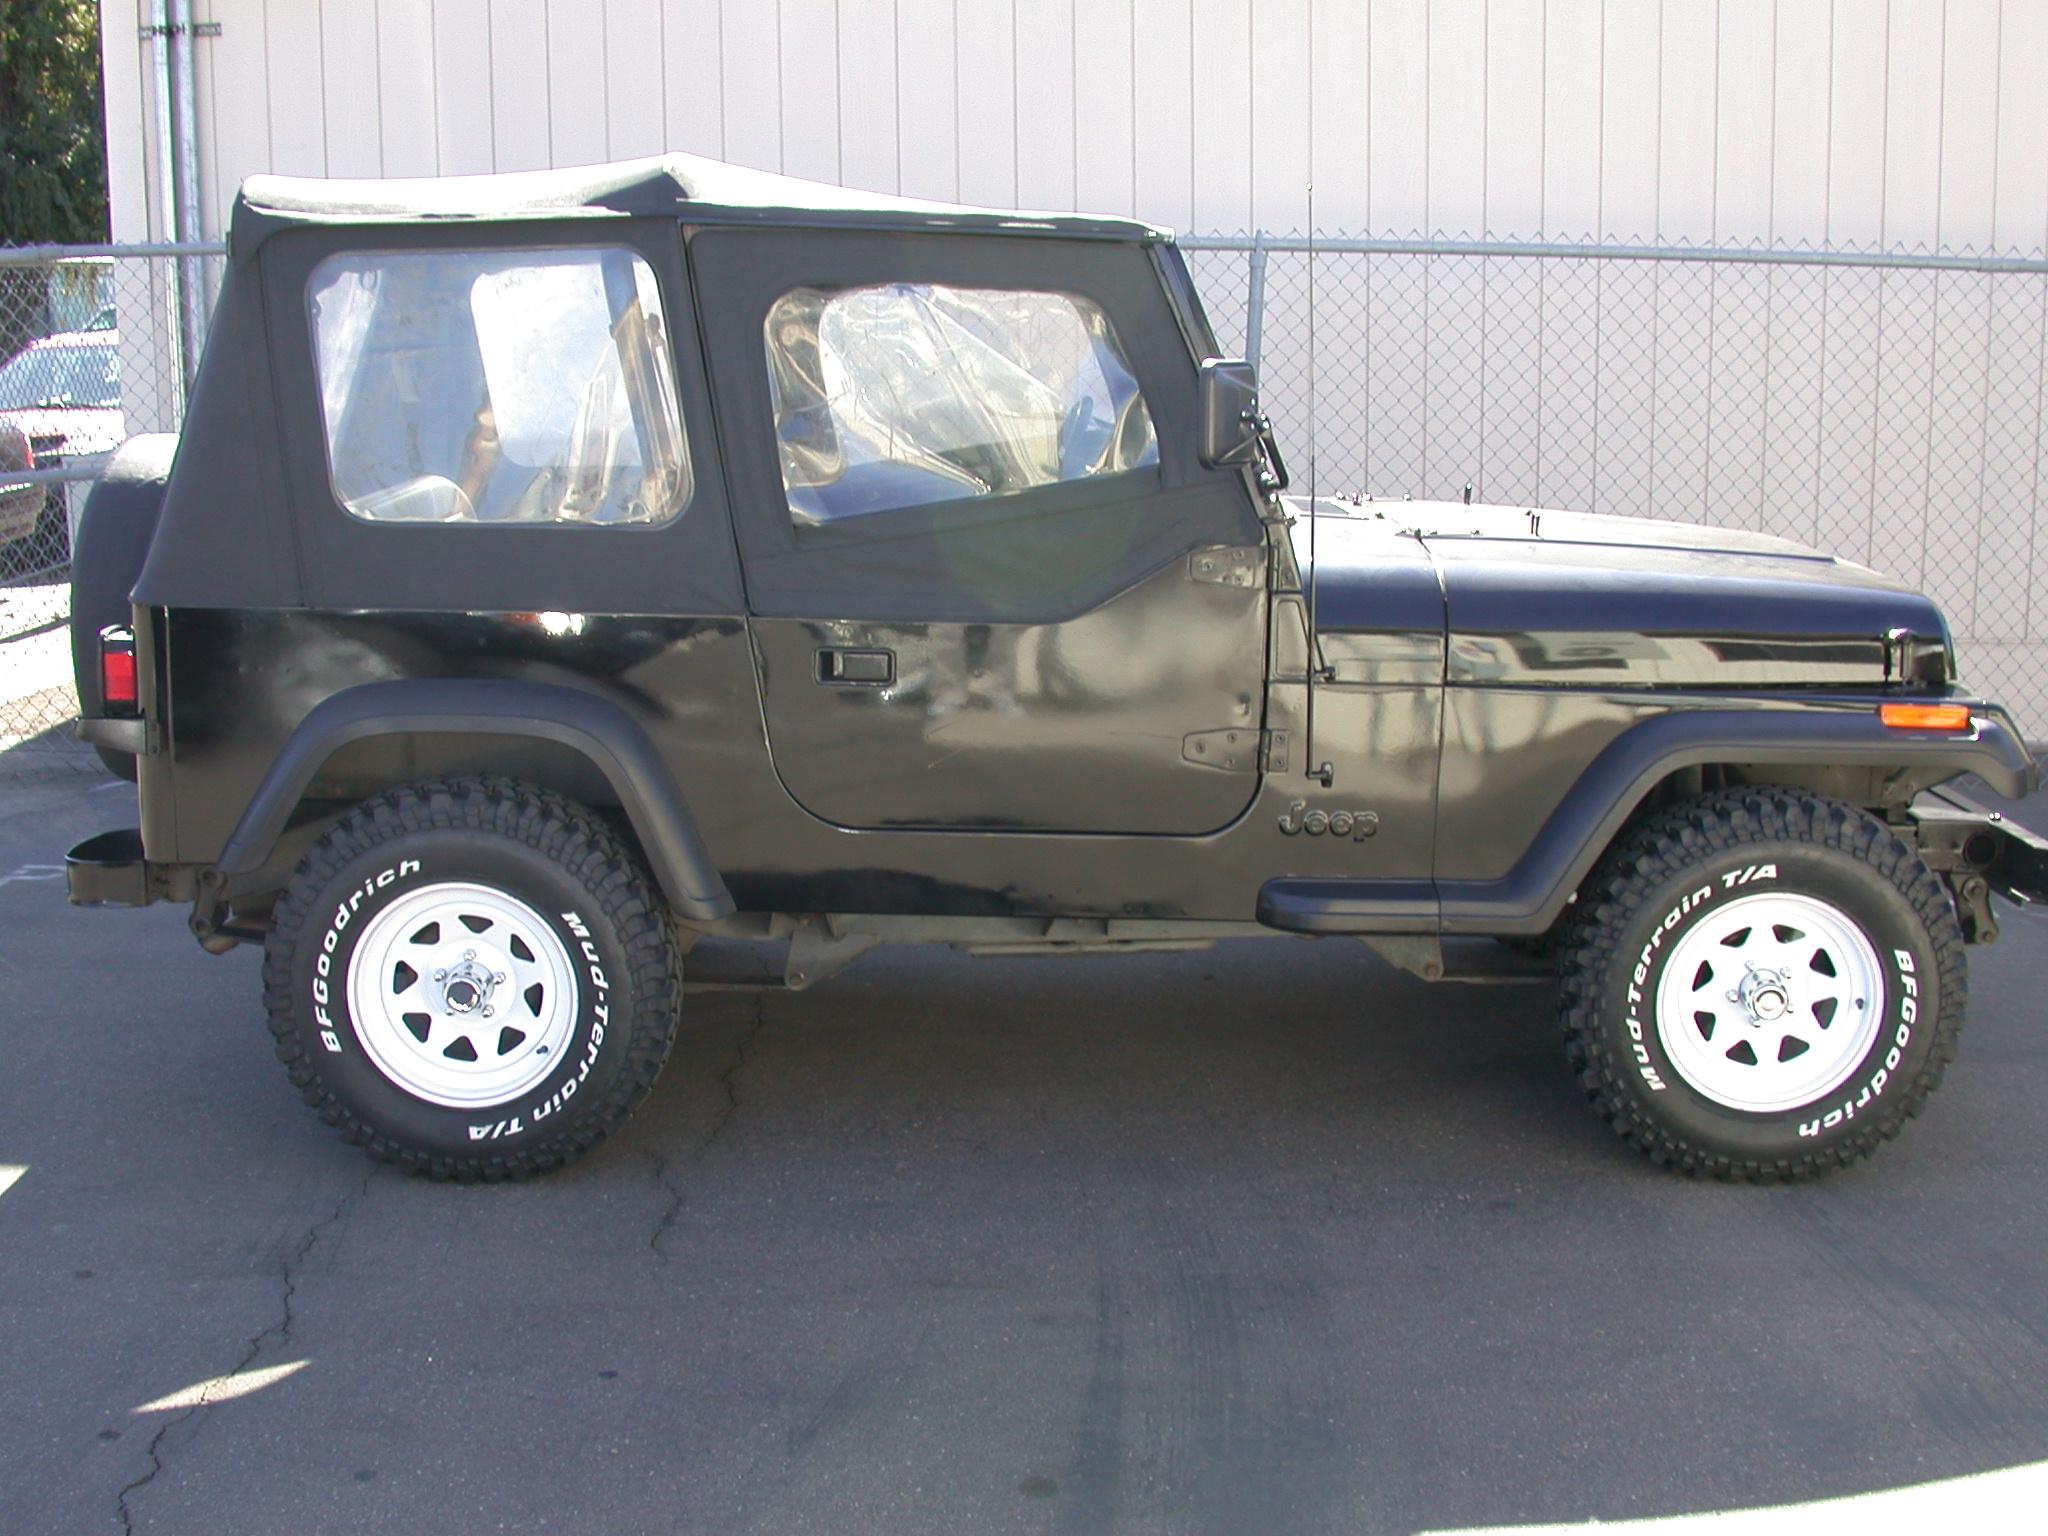 File:1995 Jeep Wrangler YJ (Right Side).jpg - Wikimedia Commons